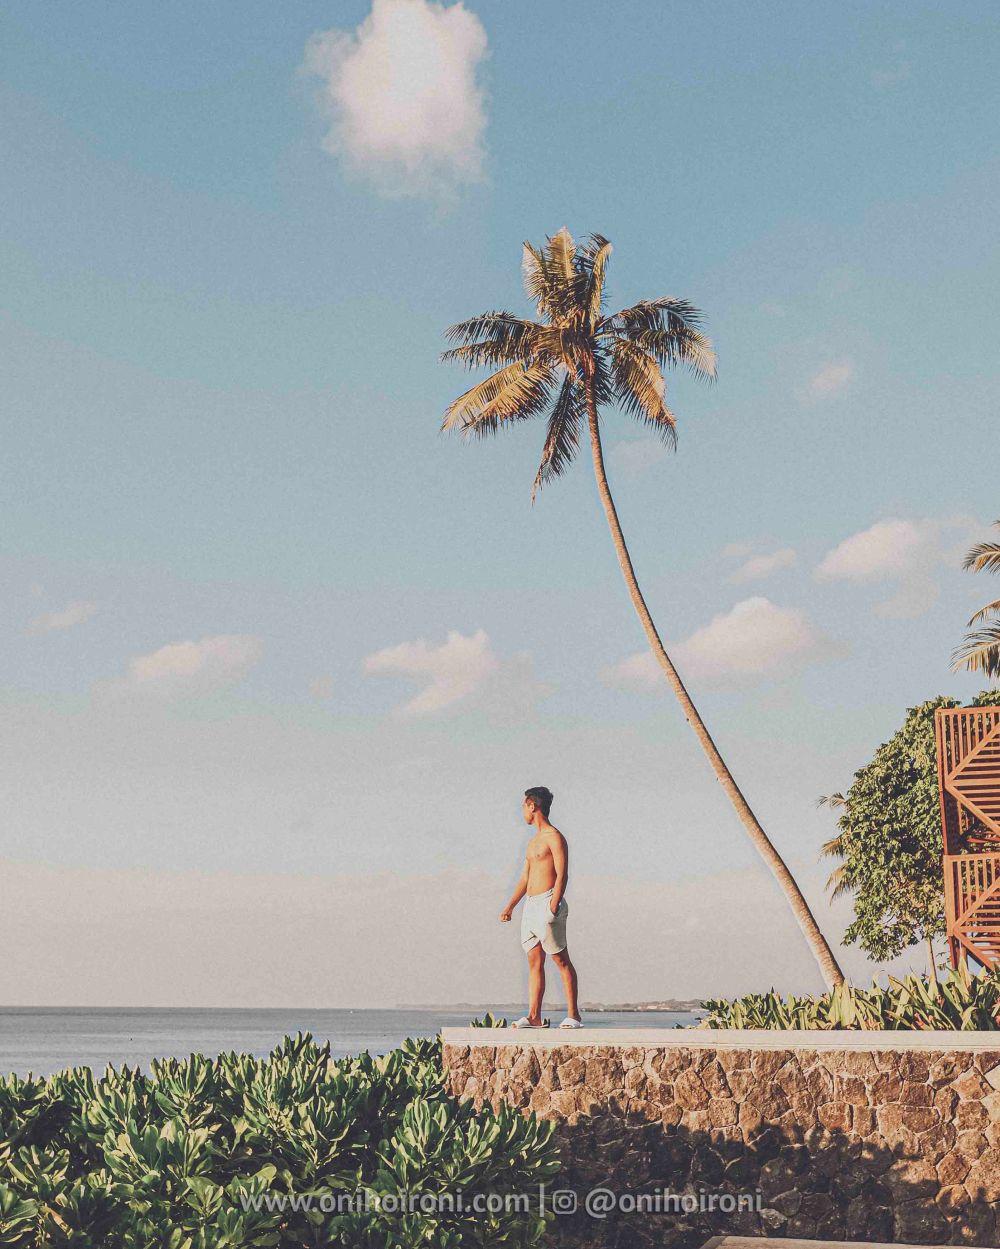 5 Spot instagramable Review Hotel Dialoog Banyuwangi oni hoironi